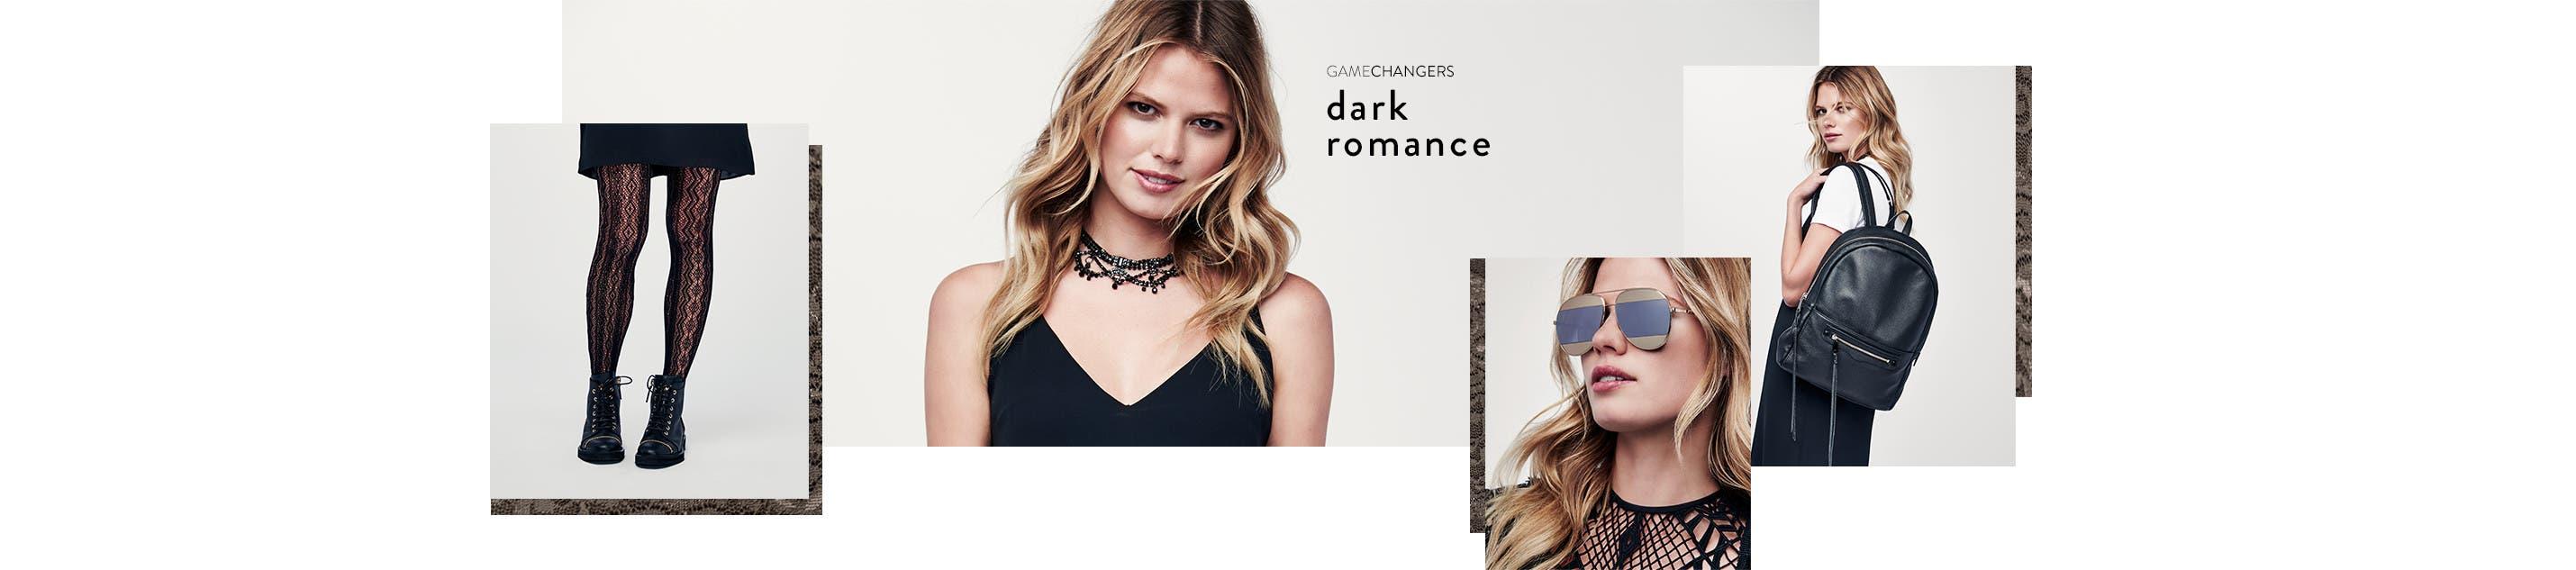 Gamechangers: gothic jewelry.